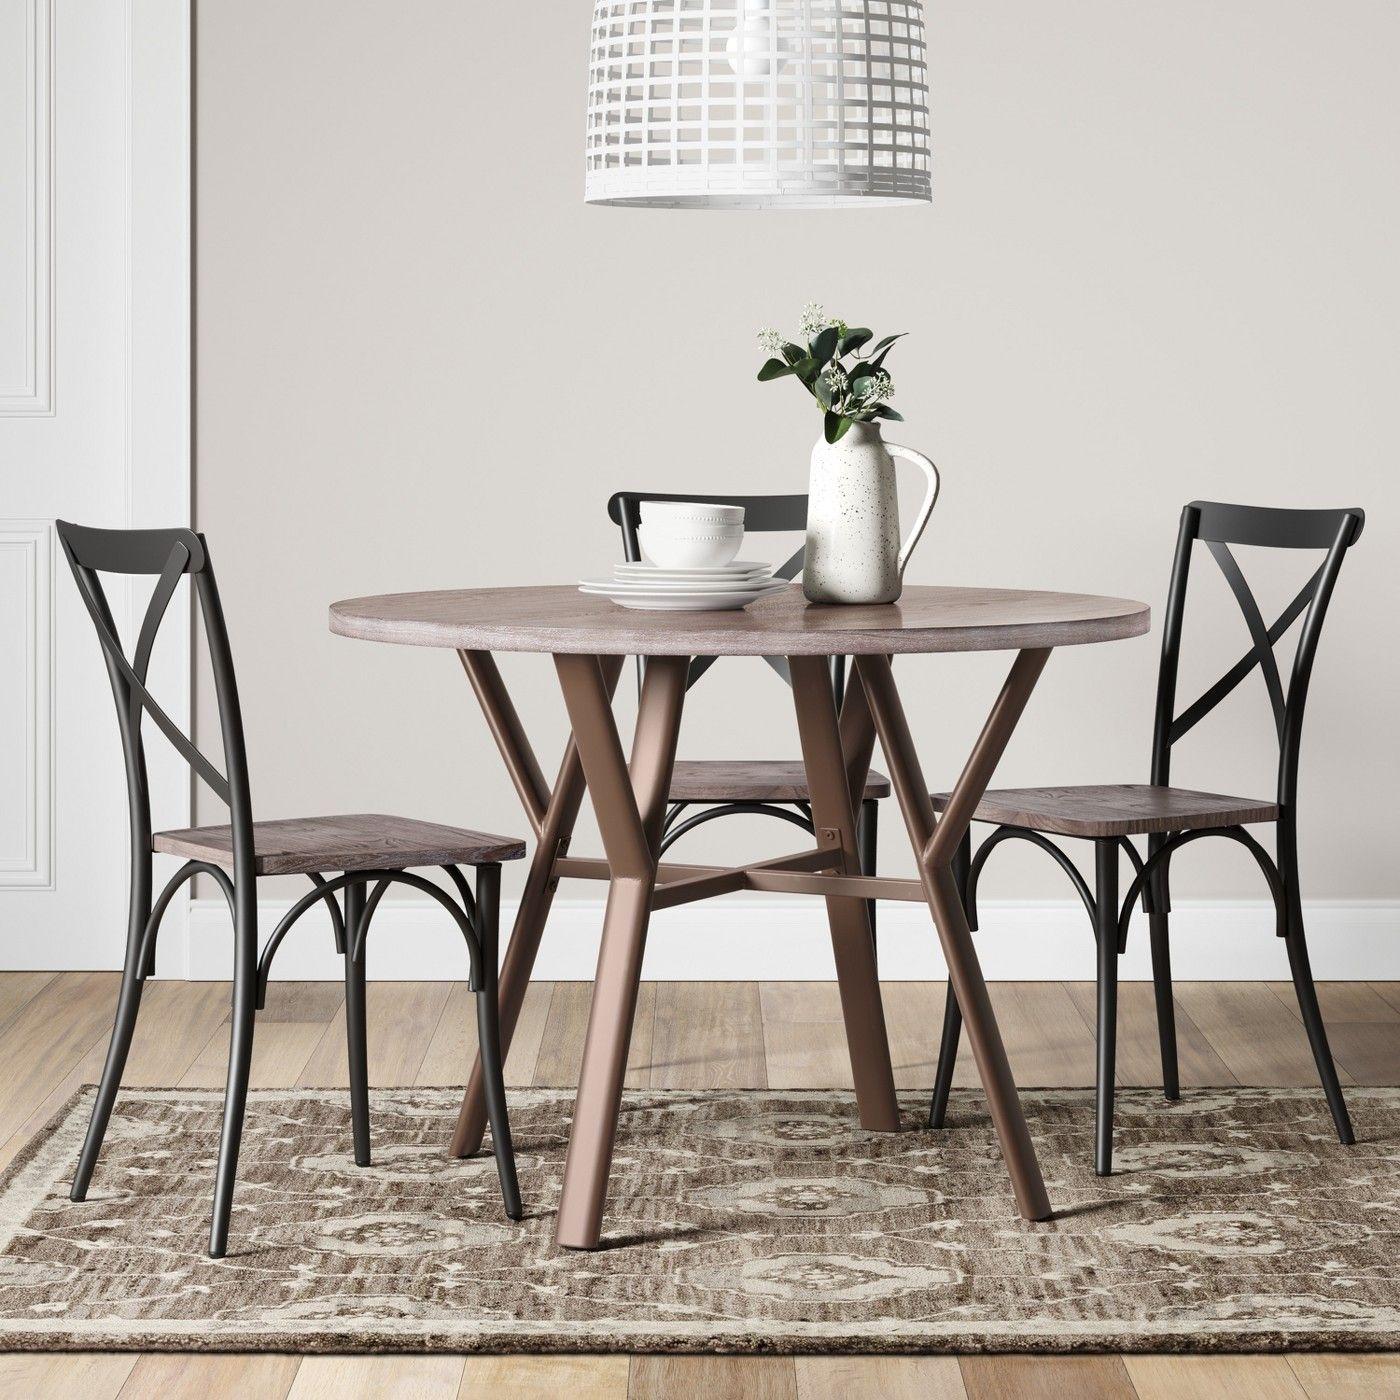 42 farmhouse dining table round black